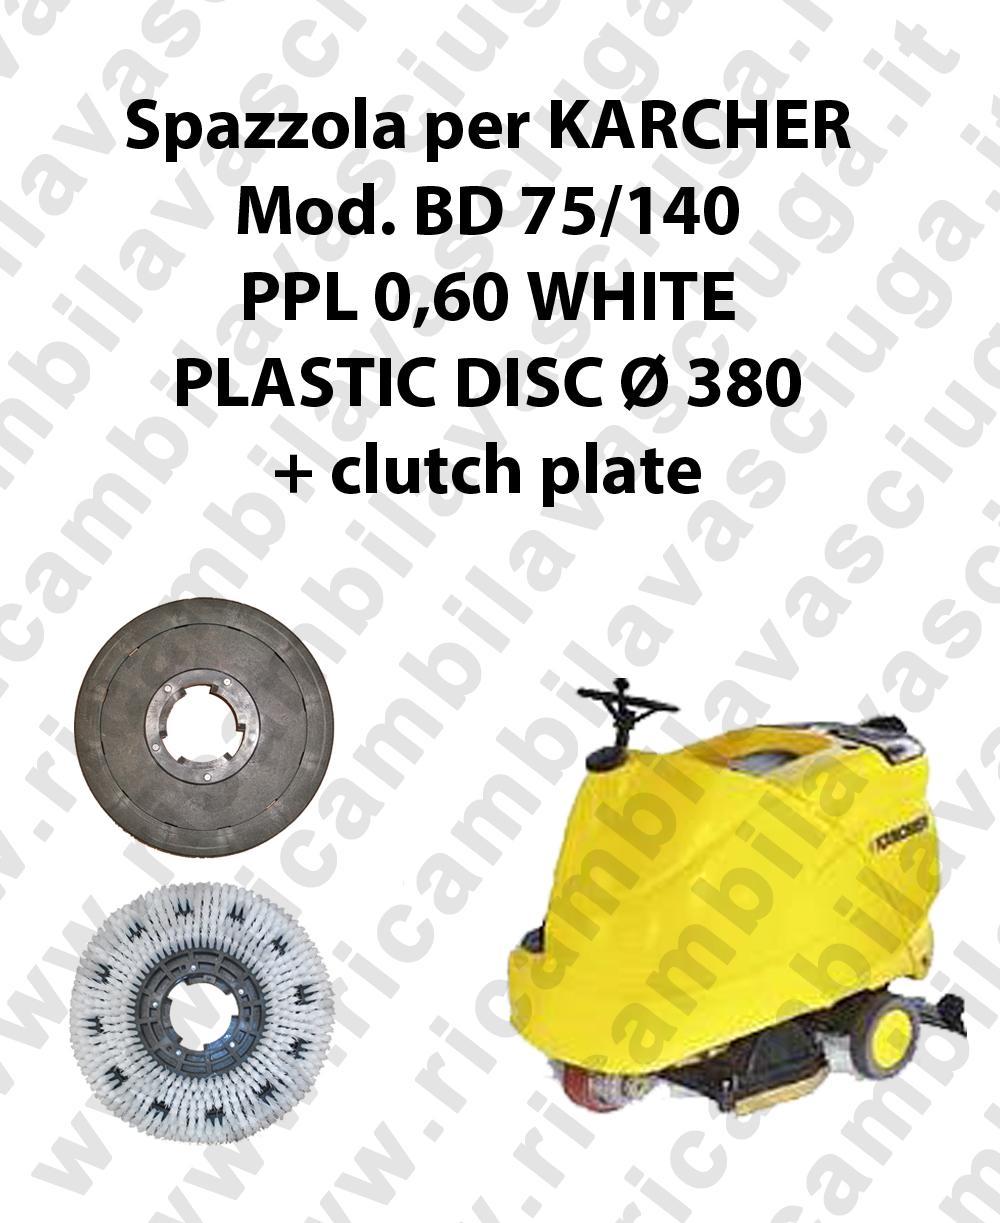 Spazzola lavare PPL 0.6 WHITE per lavapavimenti KARCHER modello BD 75/140